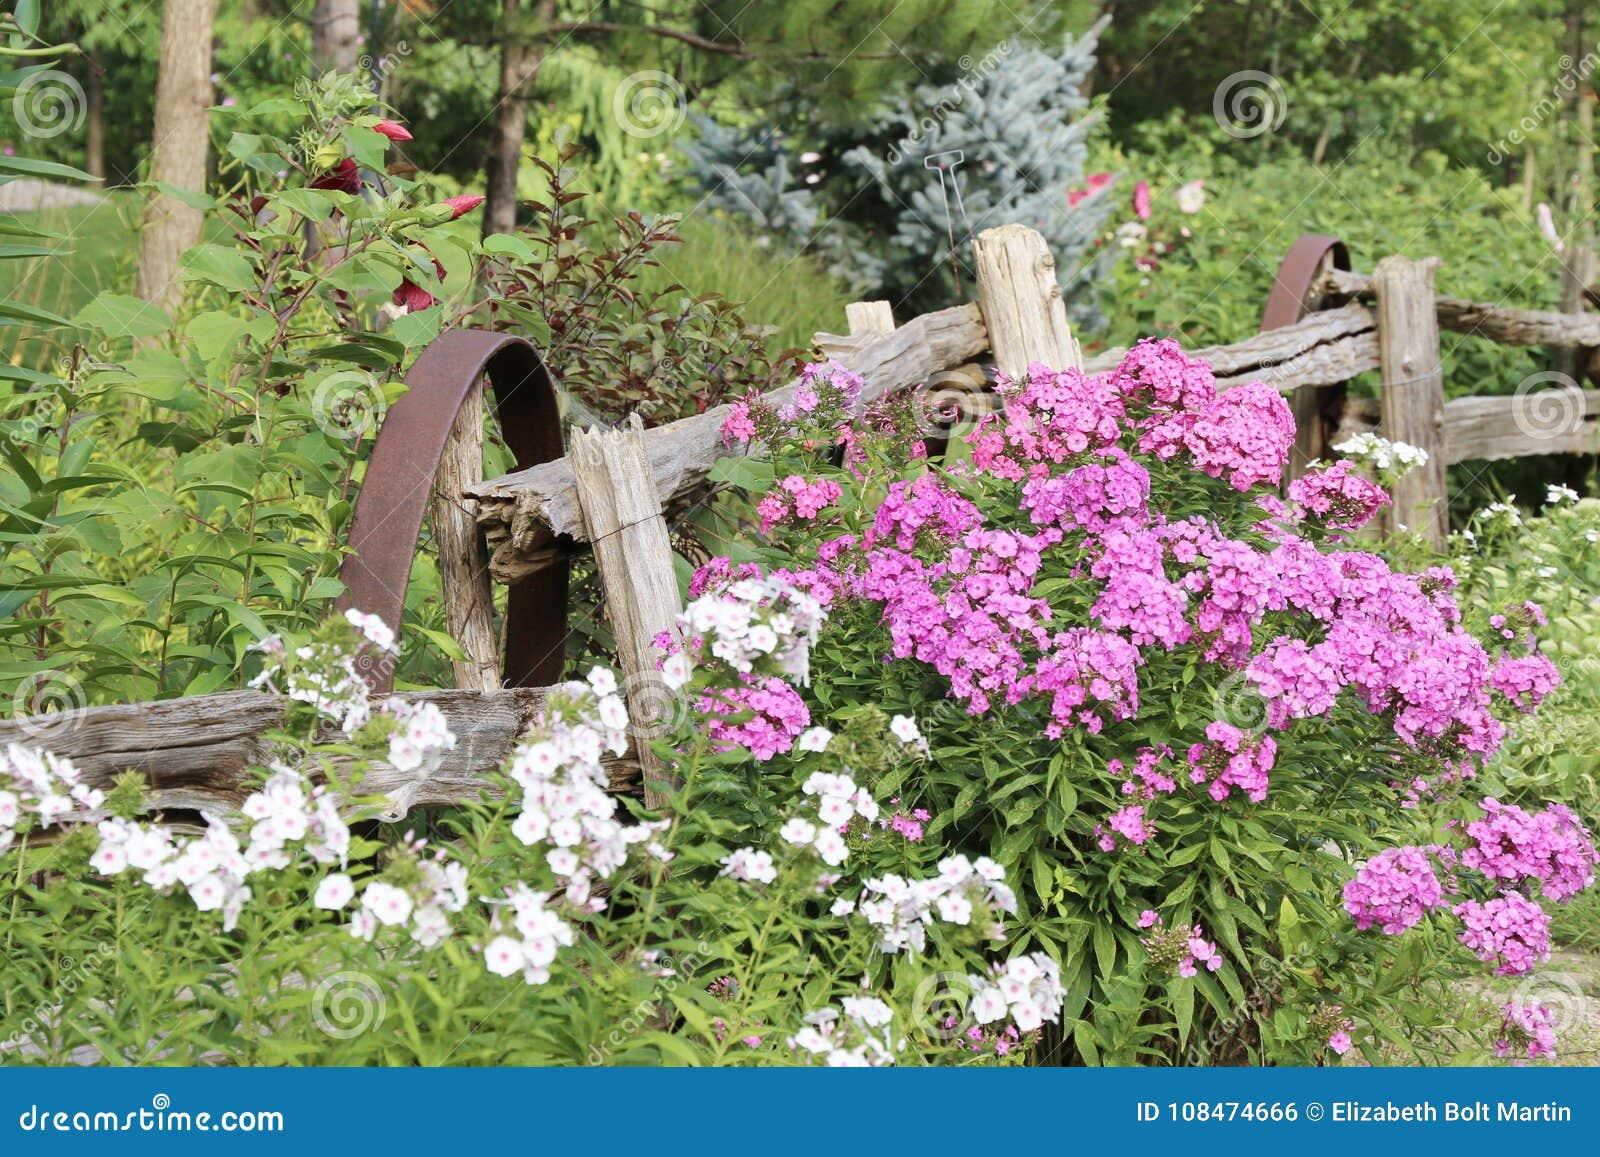 377 Garden Wagon Wheels Photos Free Royalty Free Stock Photos From Dreamstime